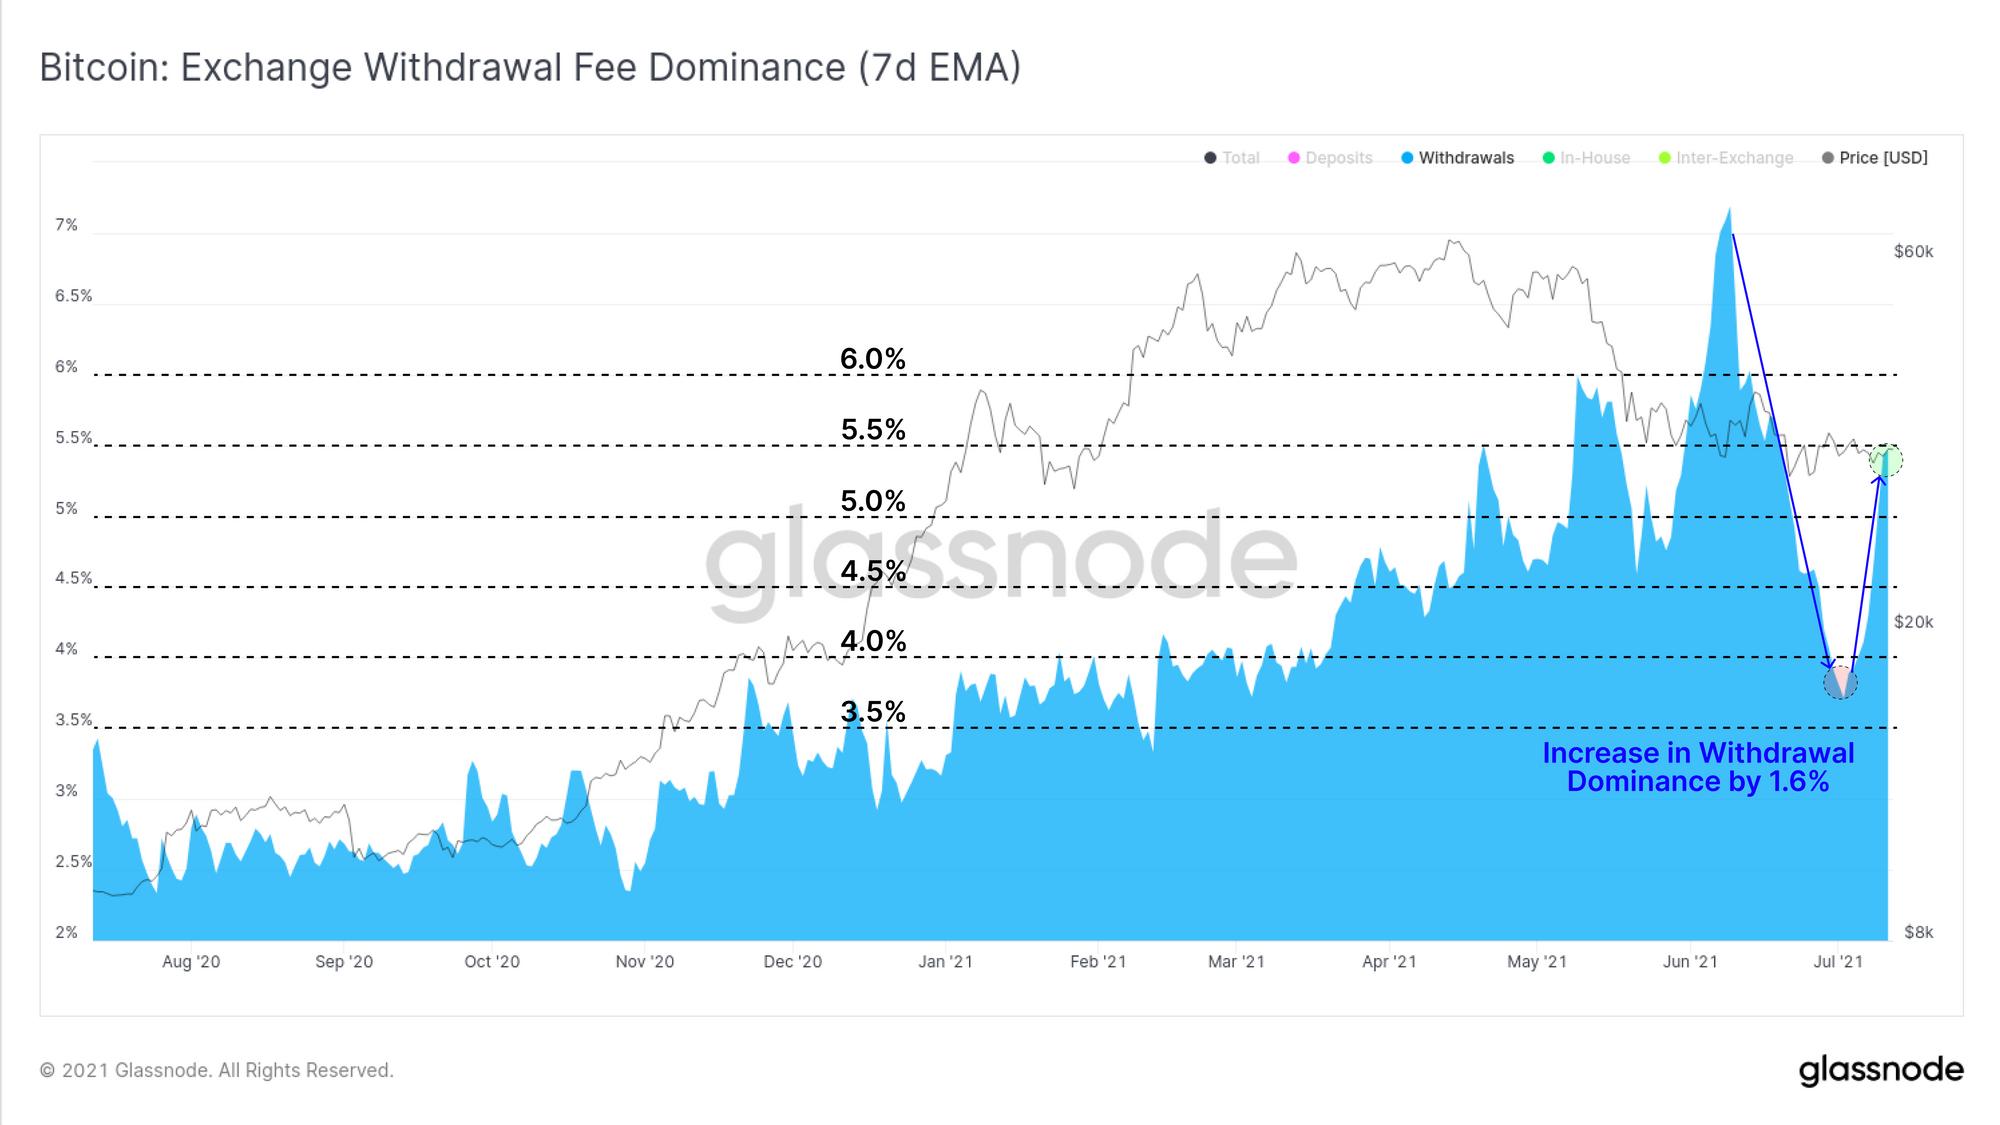 "Glassnode链上周报:加密市场""犯困"",比特币交易萎靡,矿工转向屯币,空头压力缓慢释放"